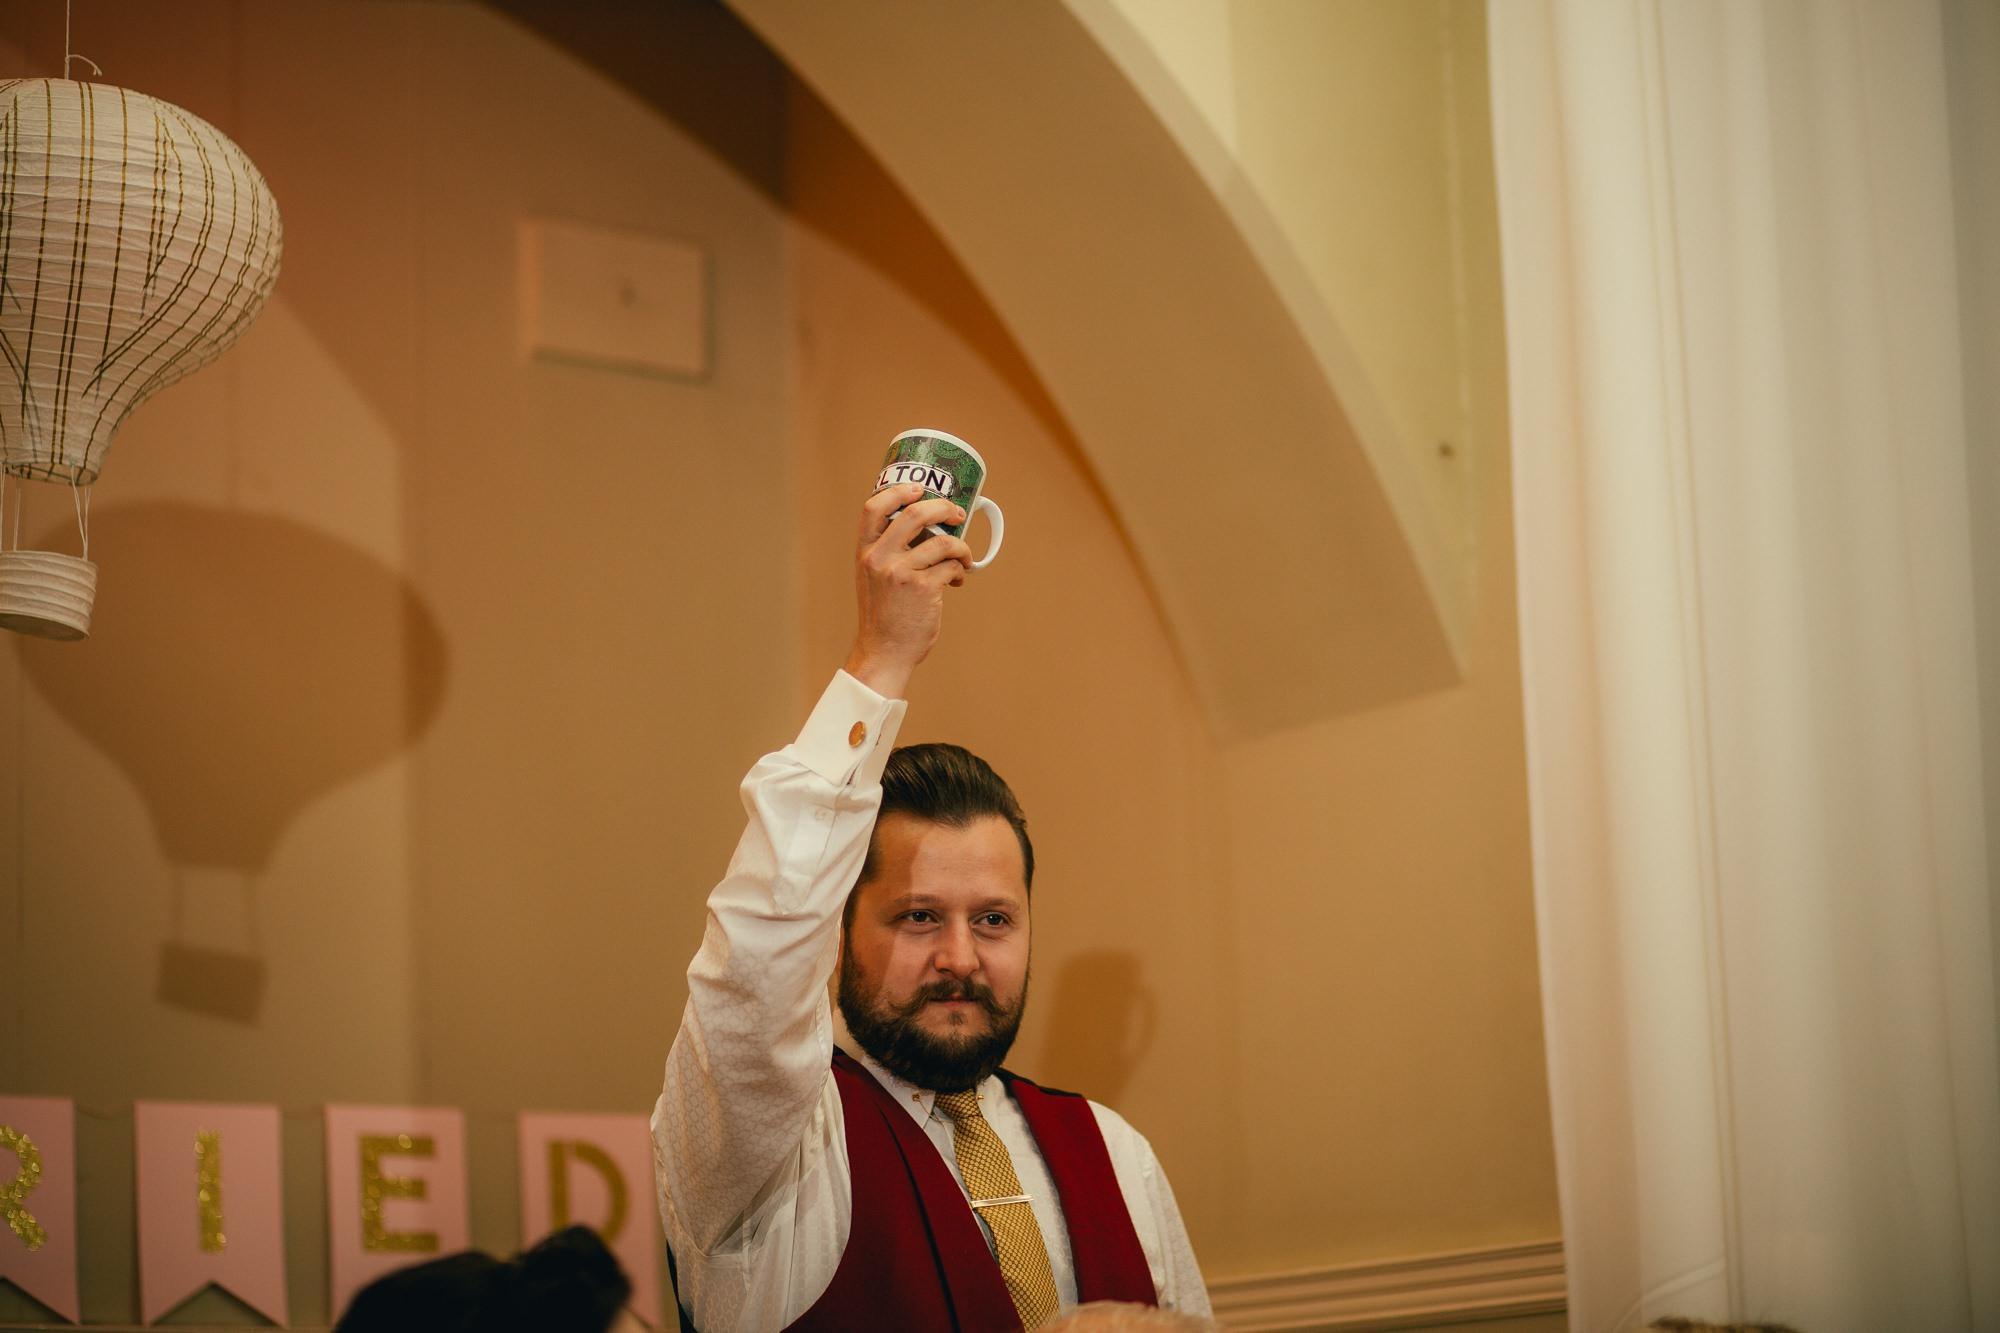 groom holding chorlton mug